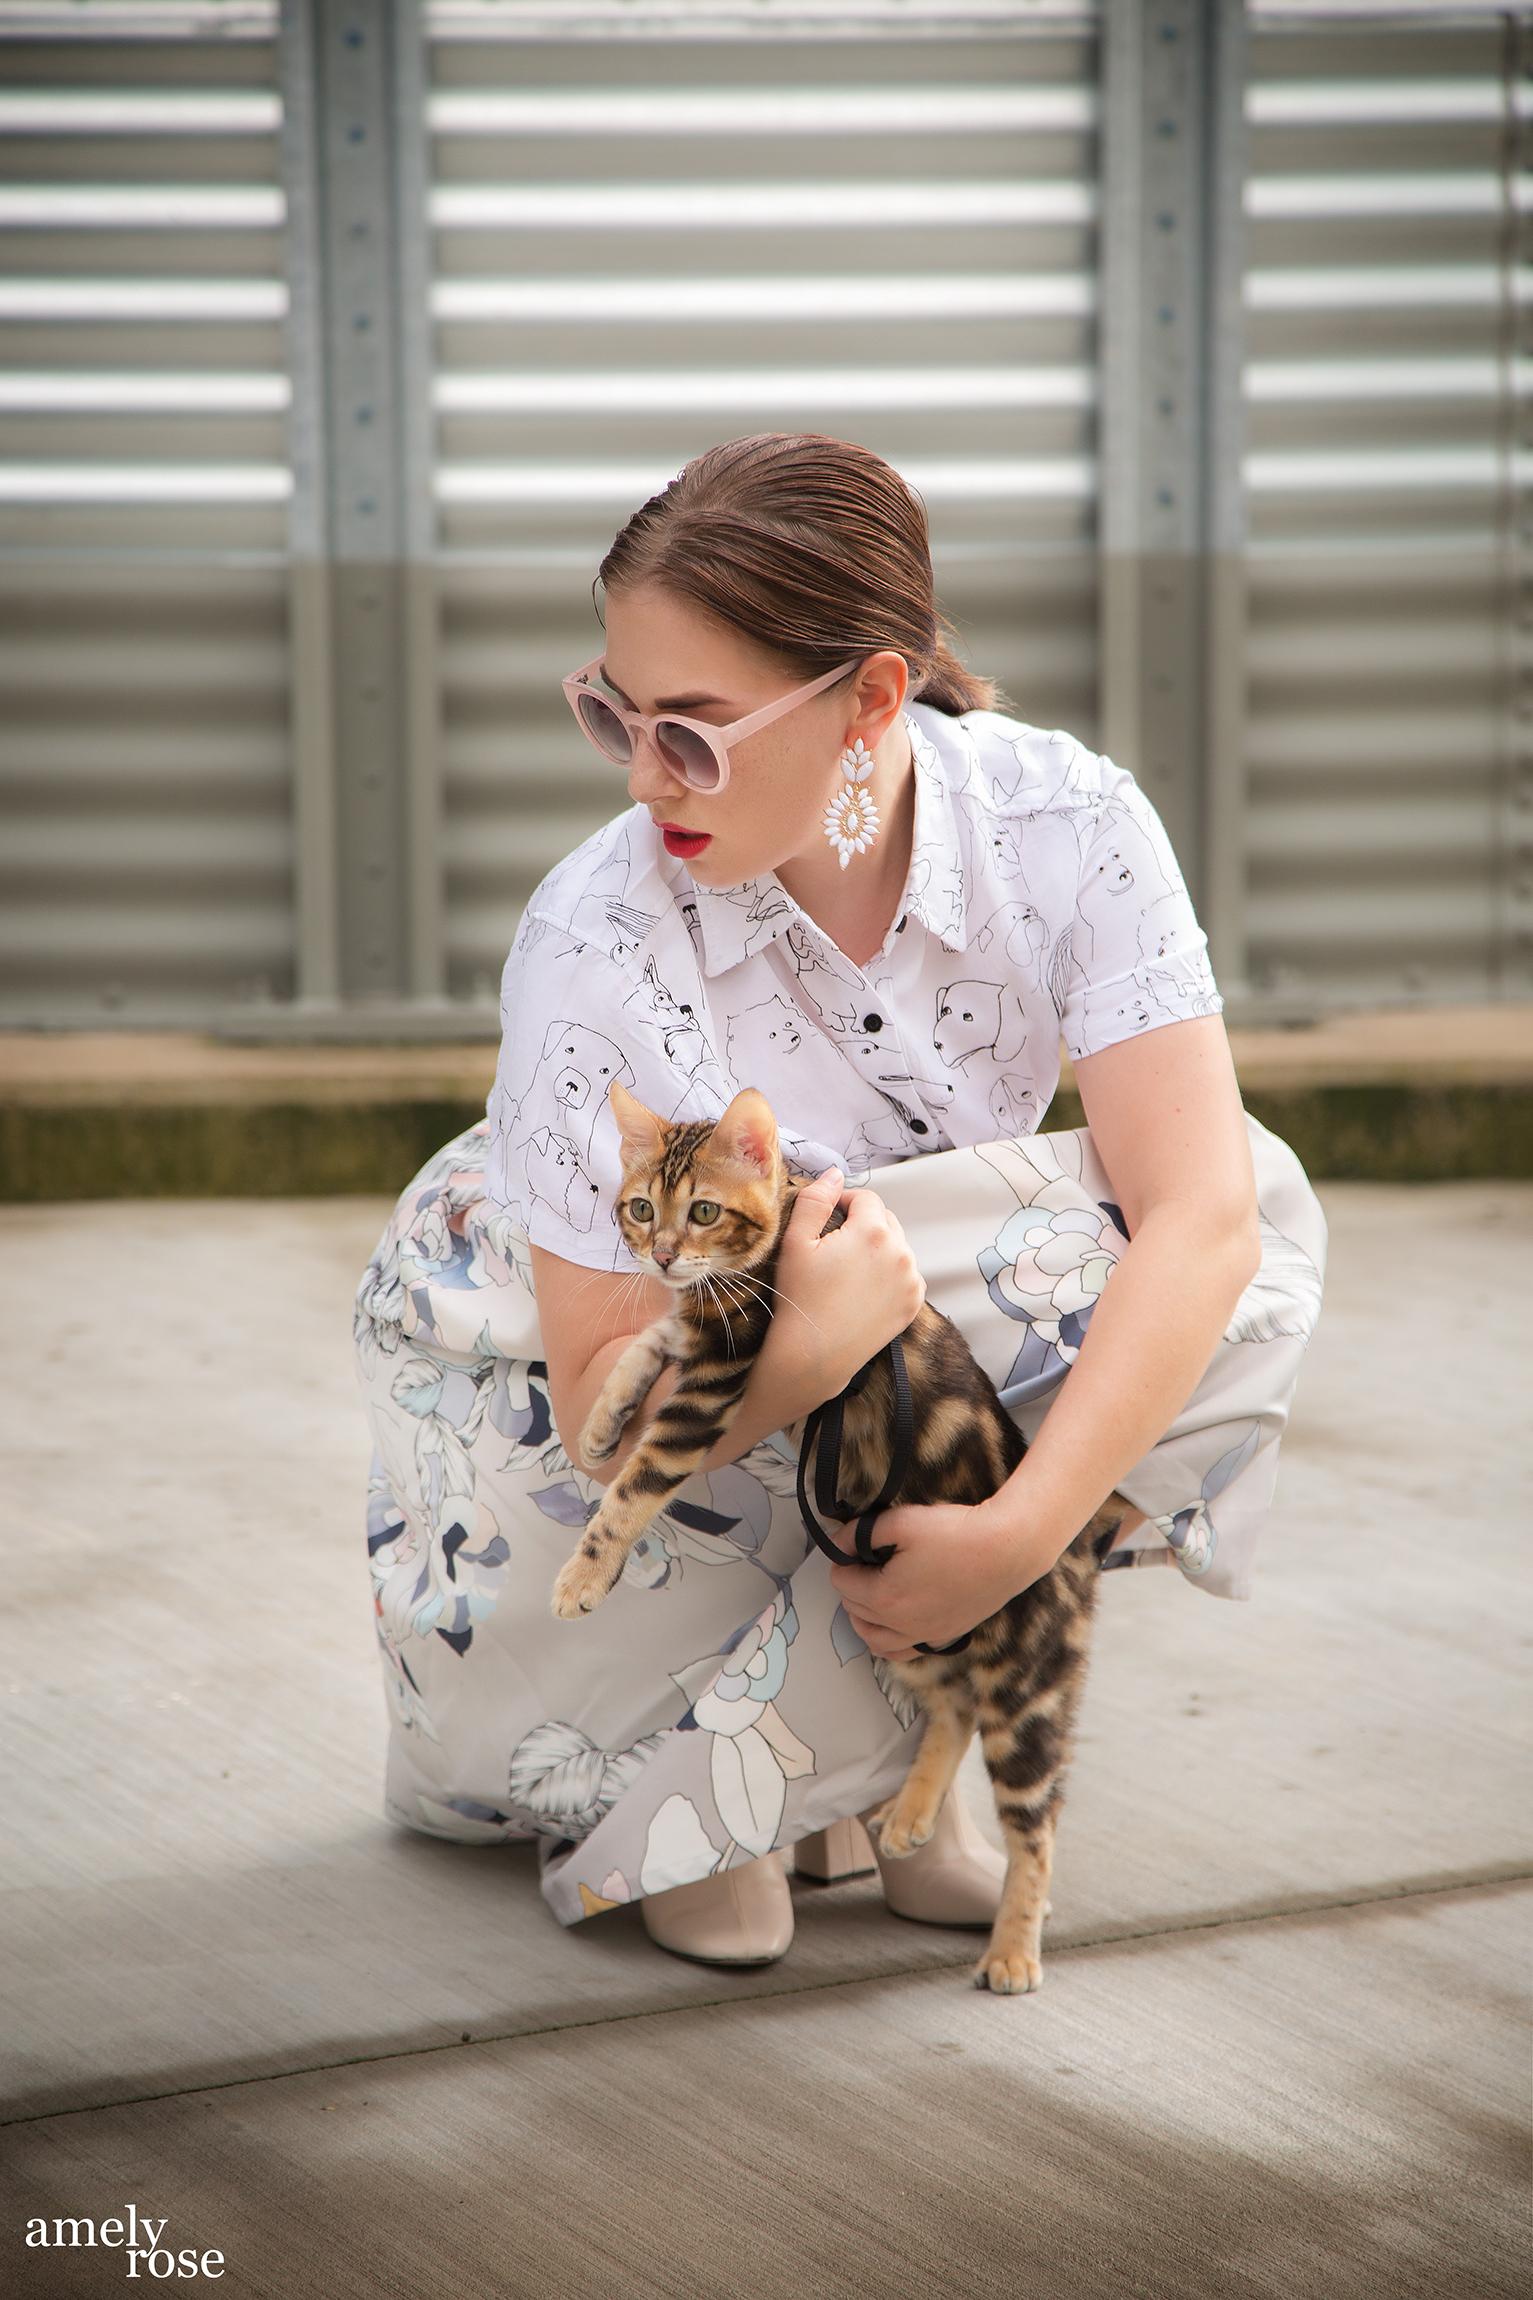 amelyrose_amely_rose_catwalk_bengal_catcontent_adventurecat_kitten_bengalcat_fashion_influencer_katze_cat